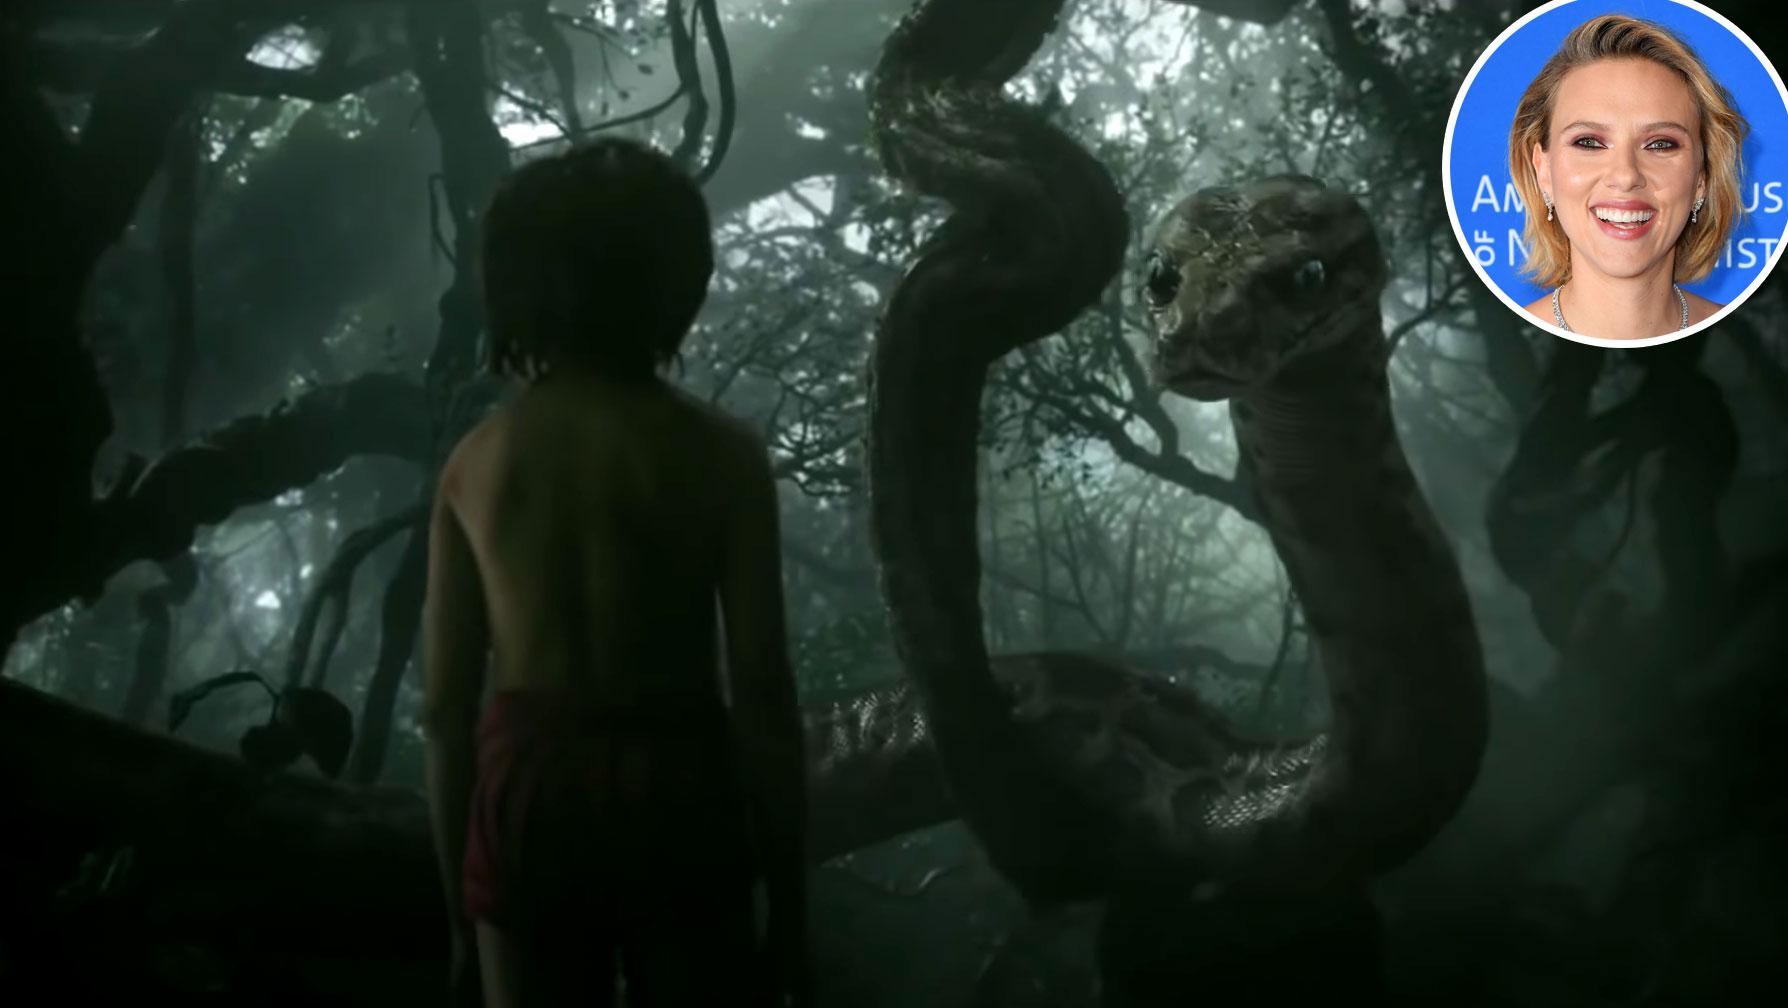 Scarlett Johansson Kaa Jungle Book Voice Over Disney and Pixar Characters - Ka in The Jungle Book (2016)